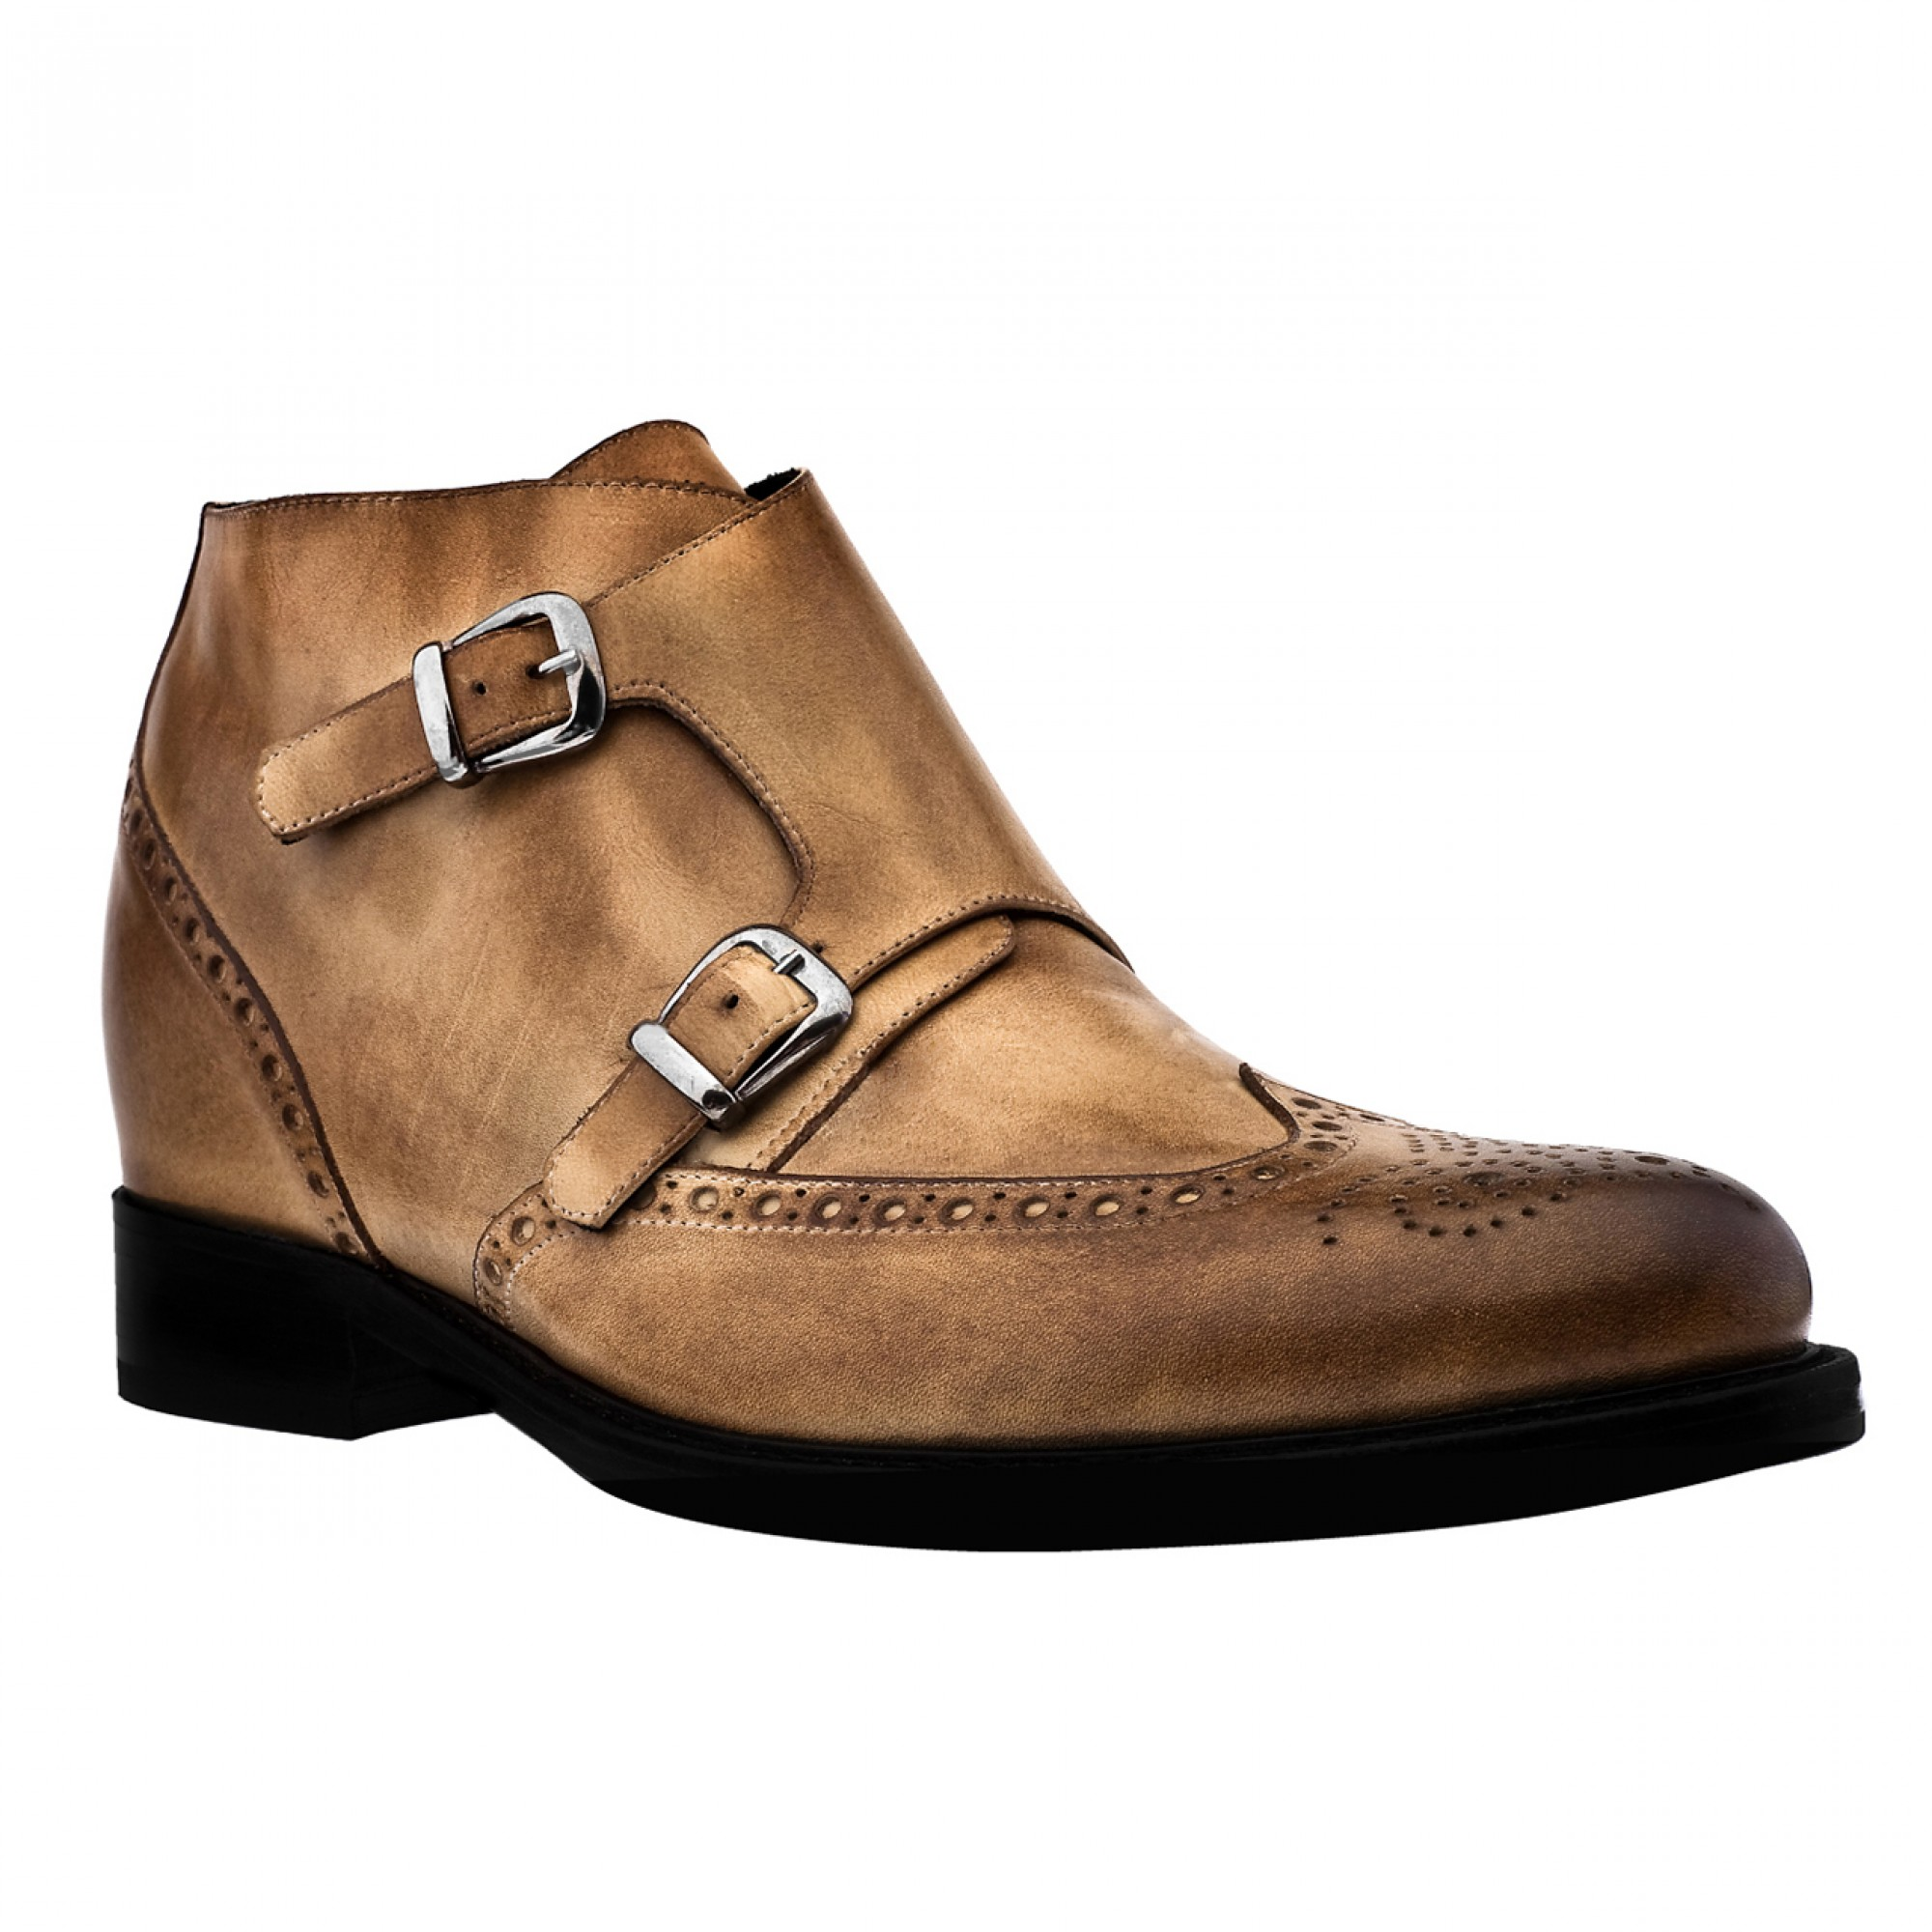 Holland Elevator shoes